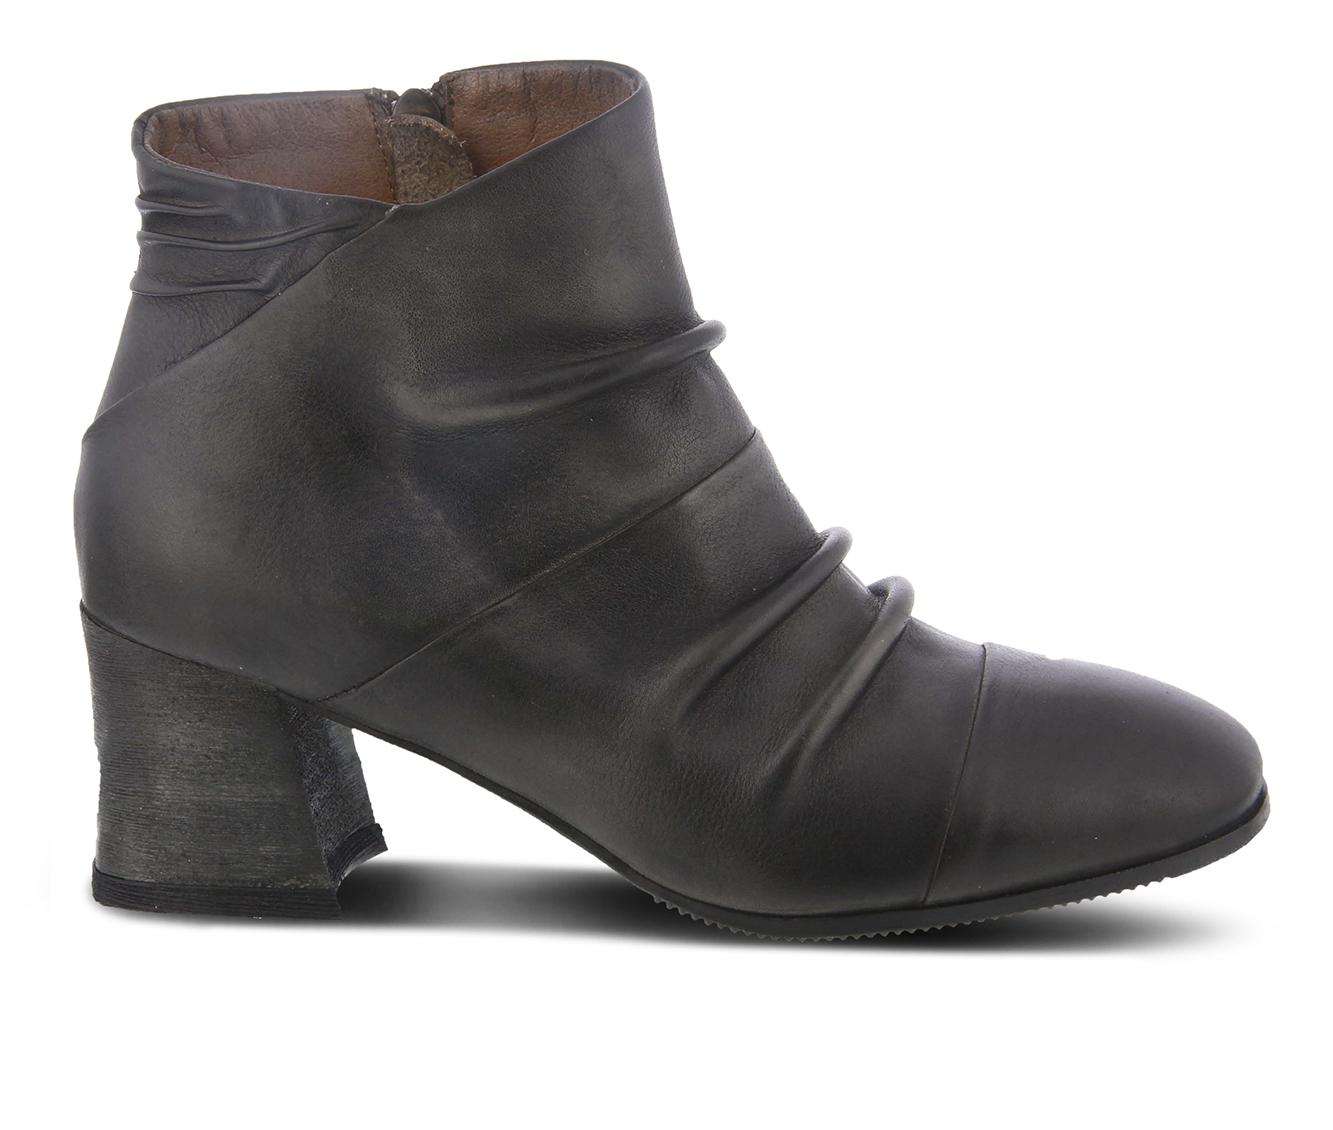 L'Artiste Melani Women's Boots (Gray Leather)